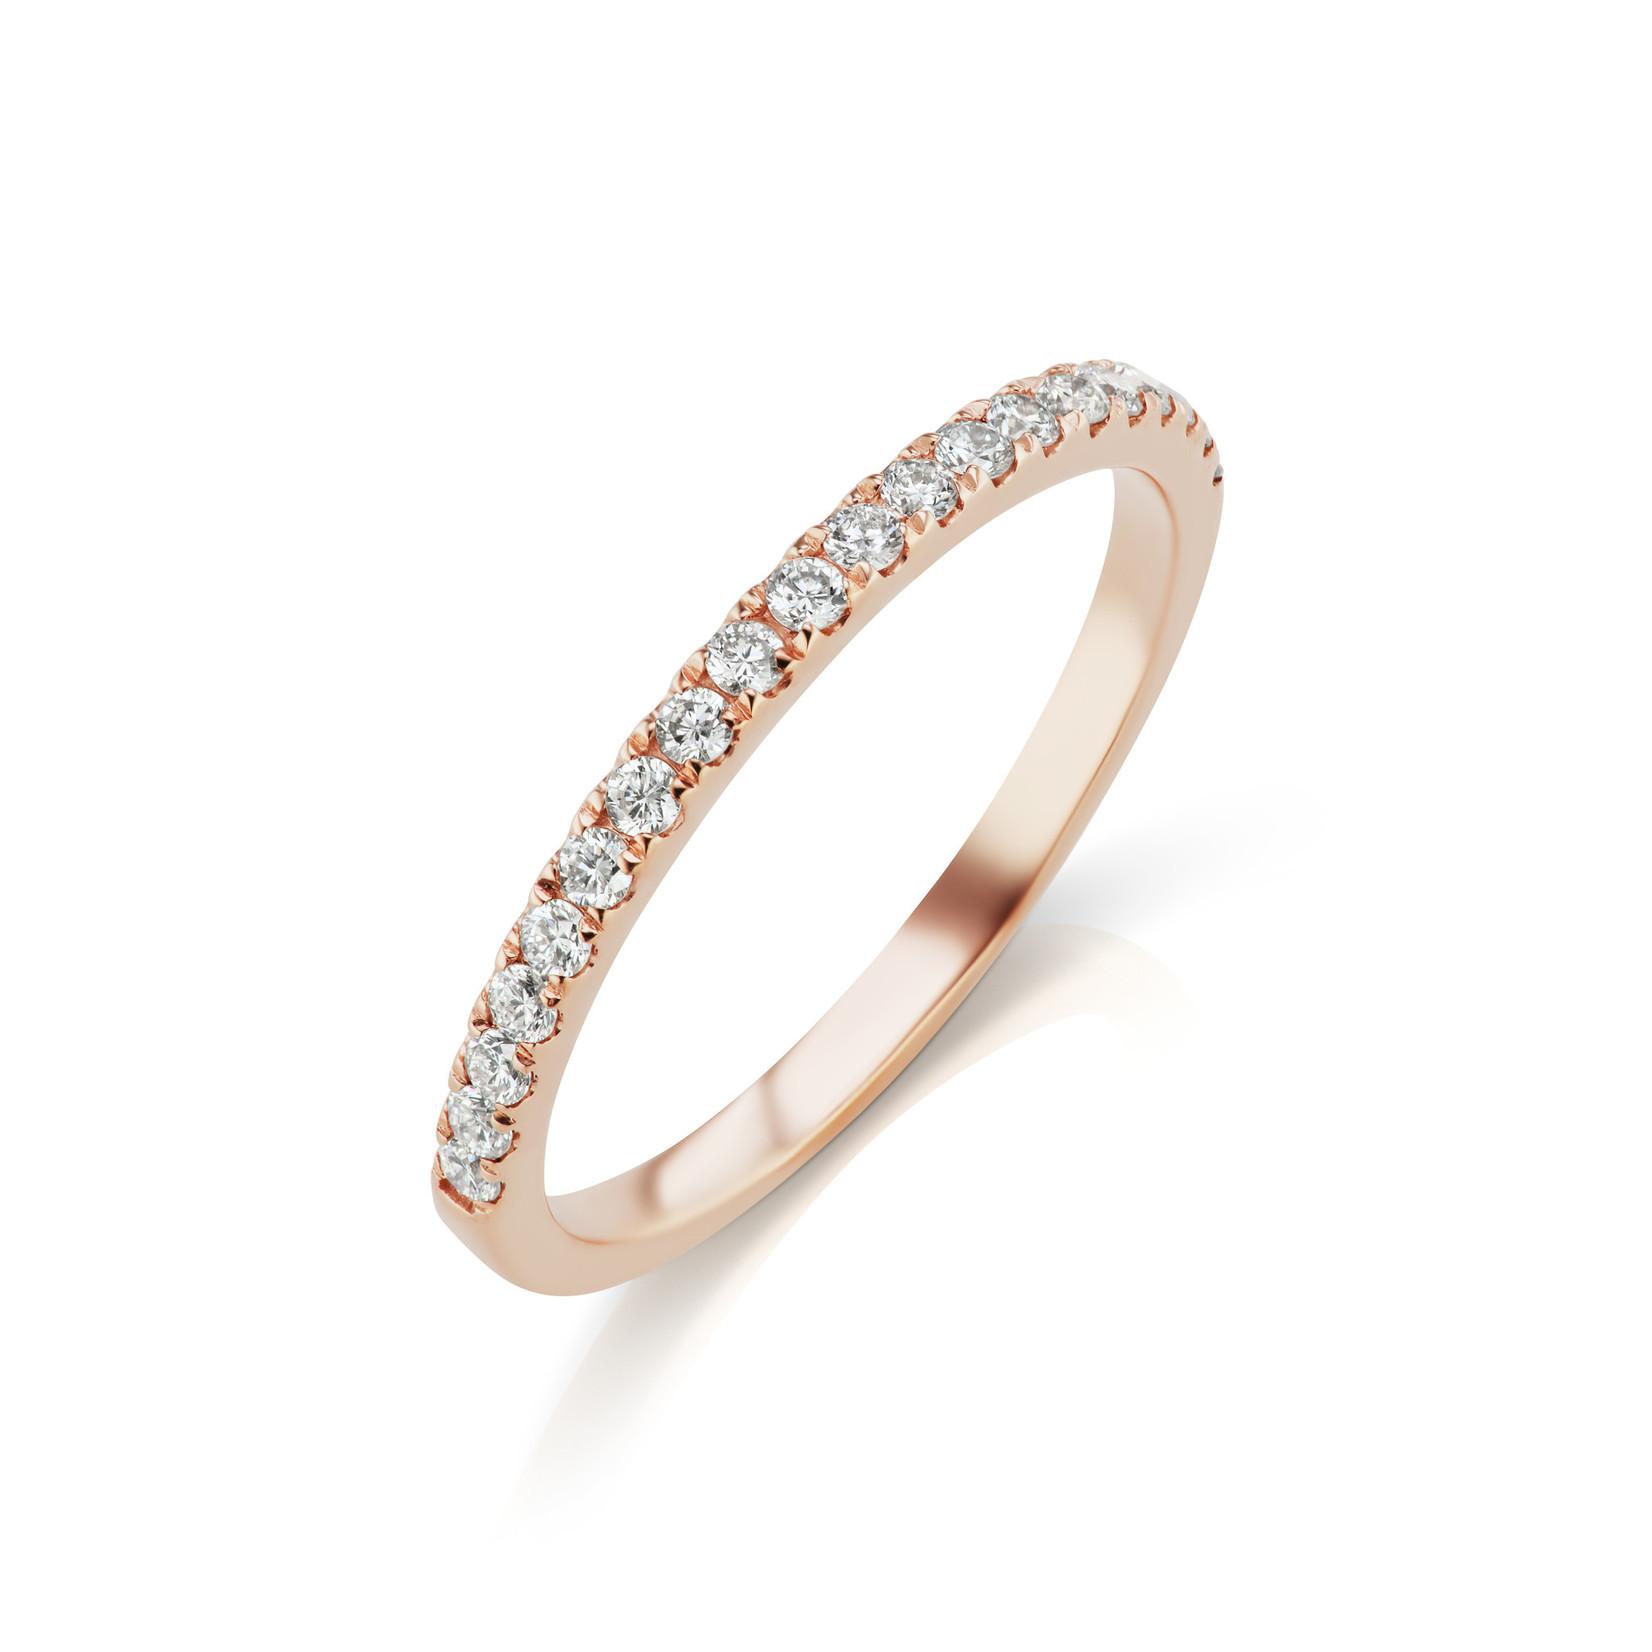 KBH Jewels Traditio Split Band Ring